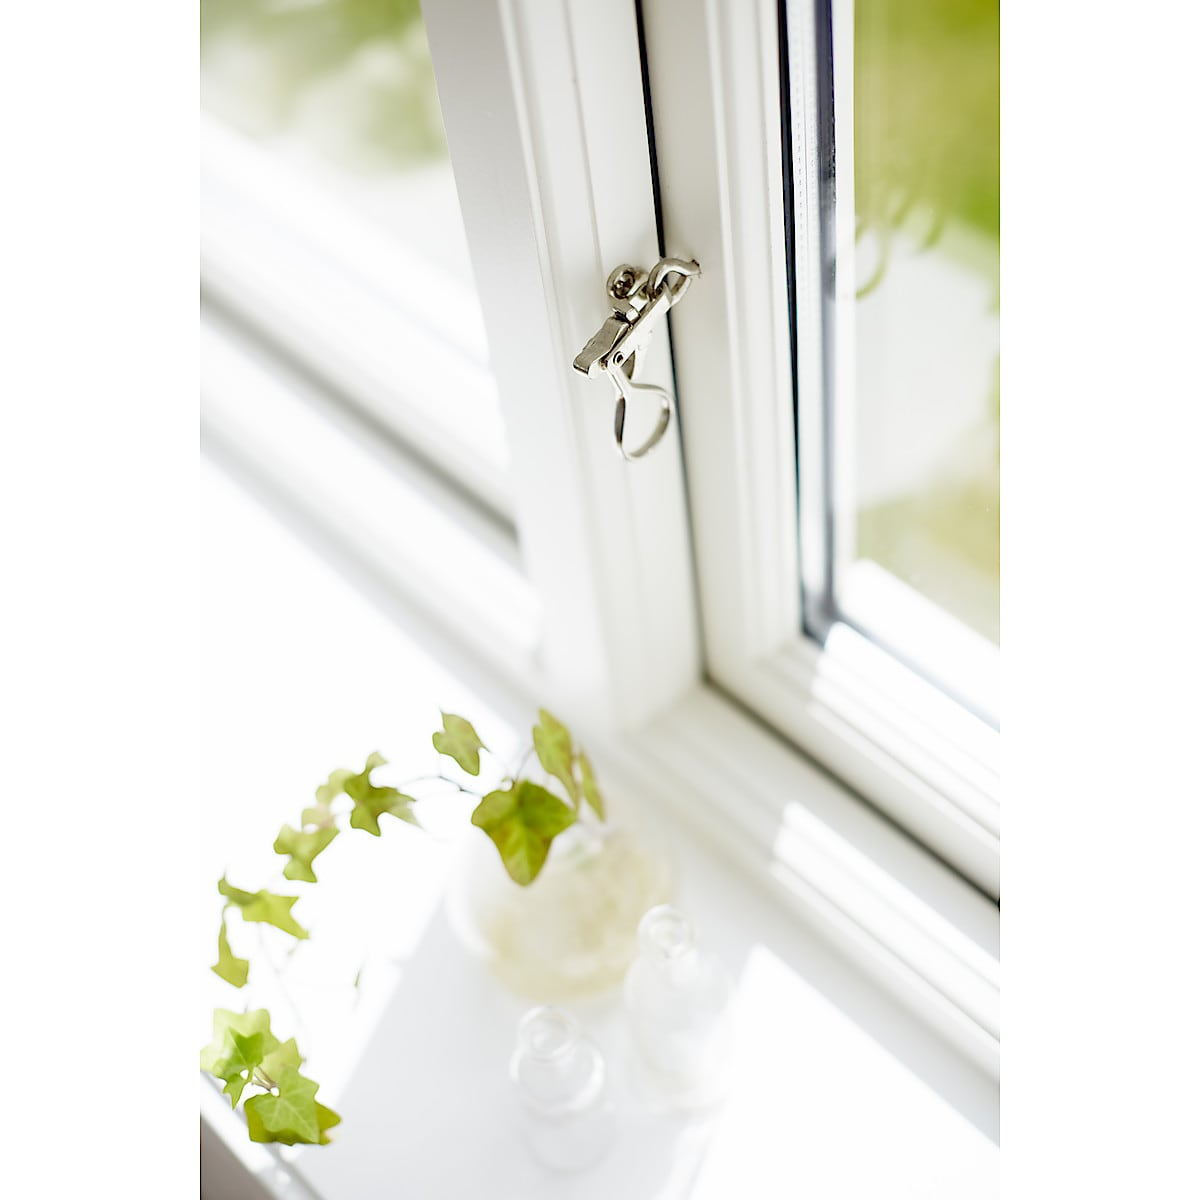 Ikkunalukko